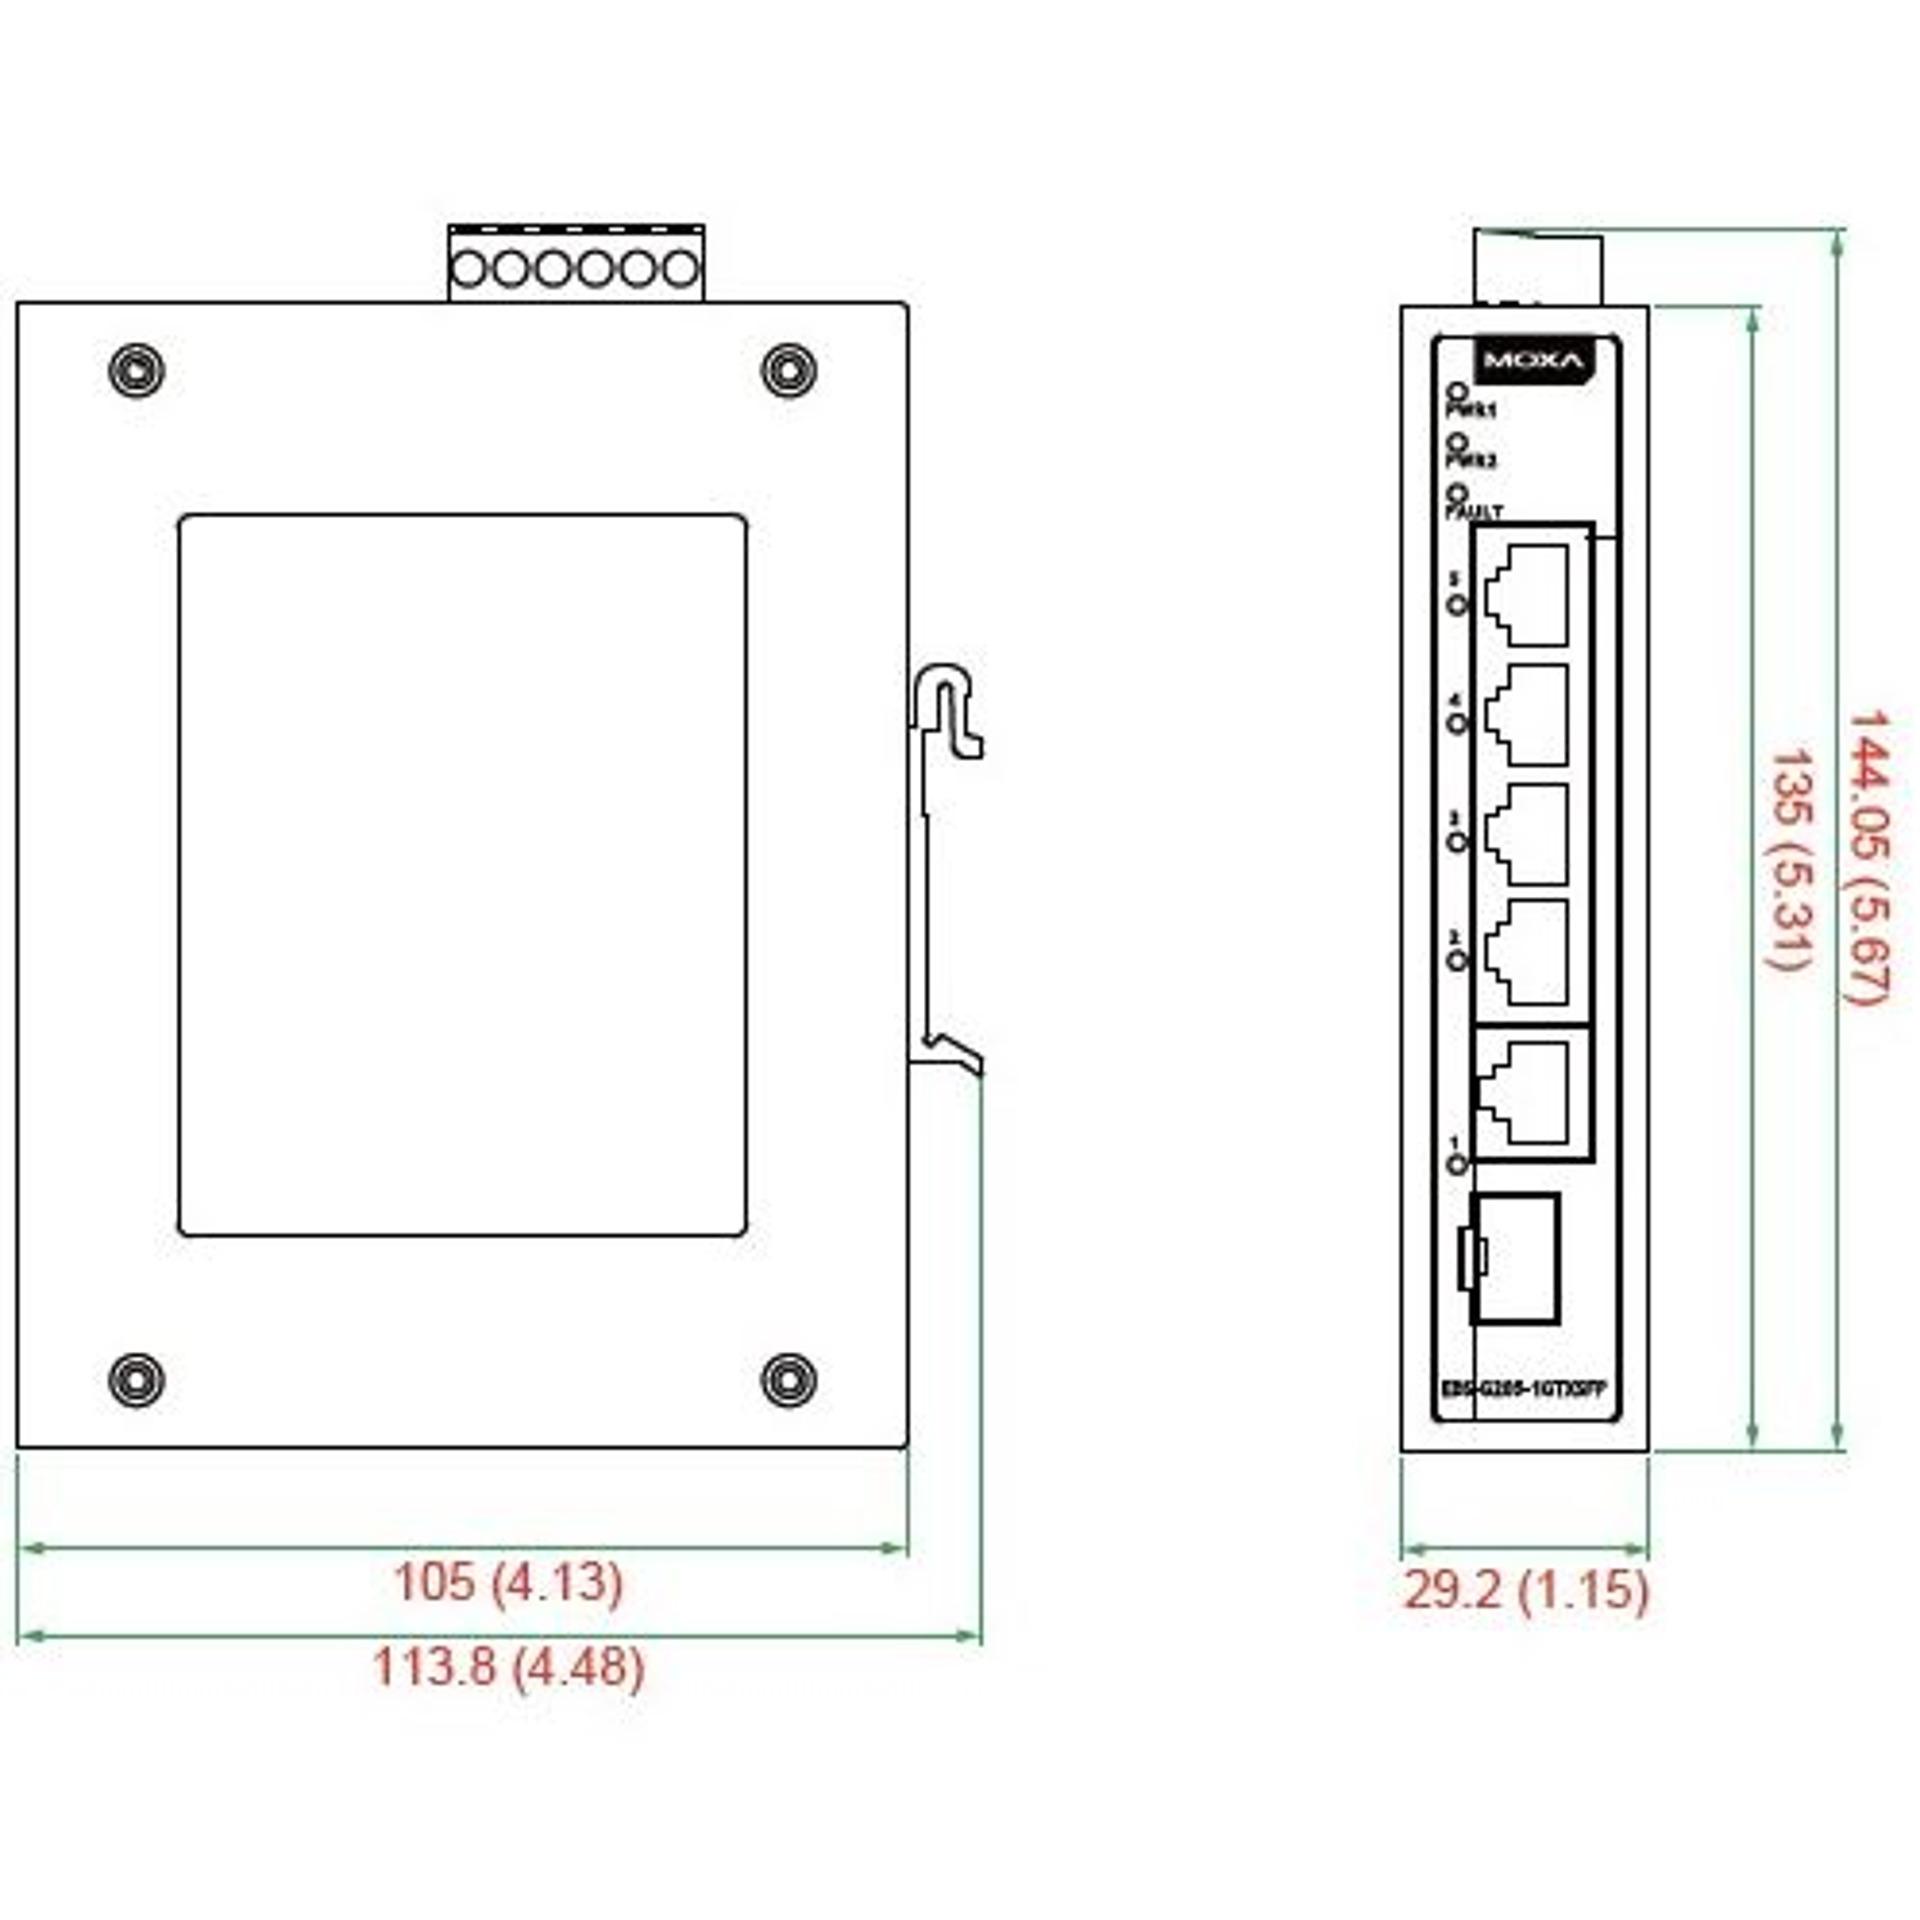 Eds G205 1gtxsfp Switches Von Moxa Bellequip